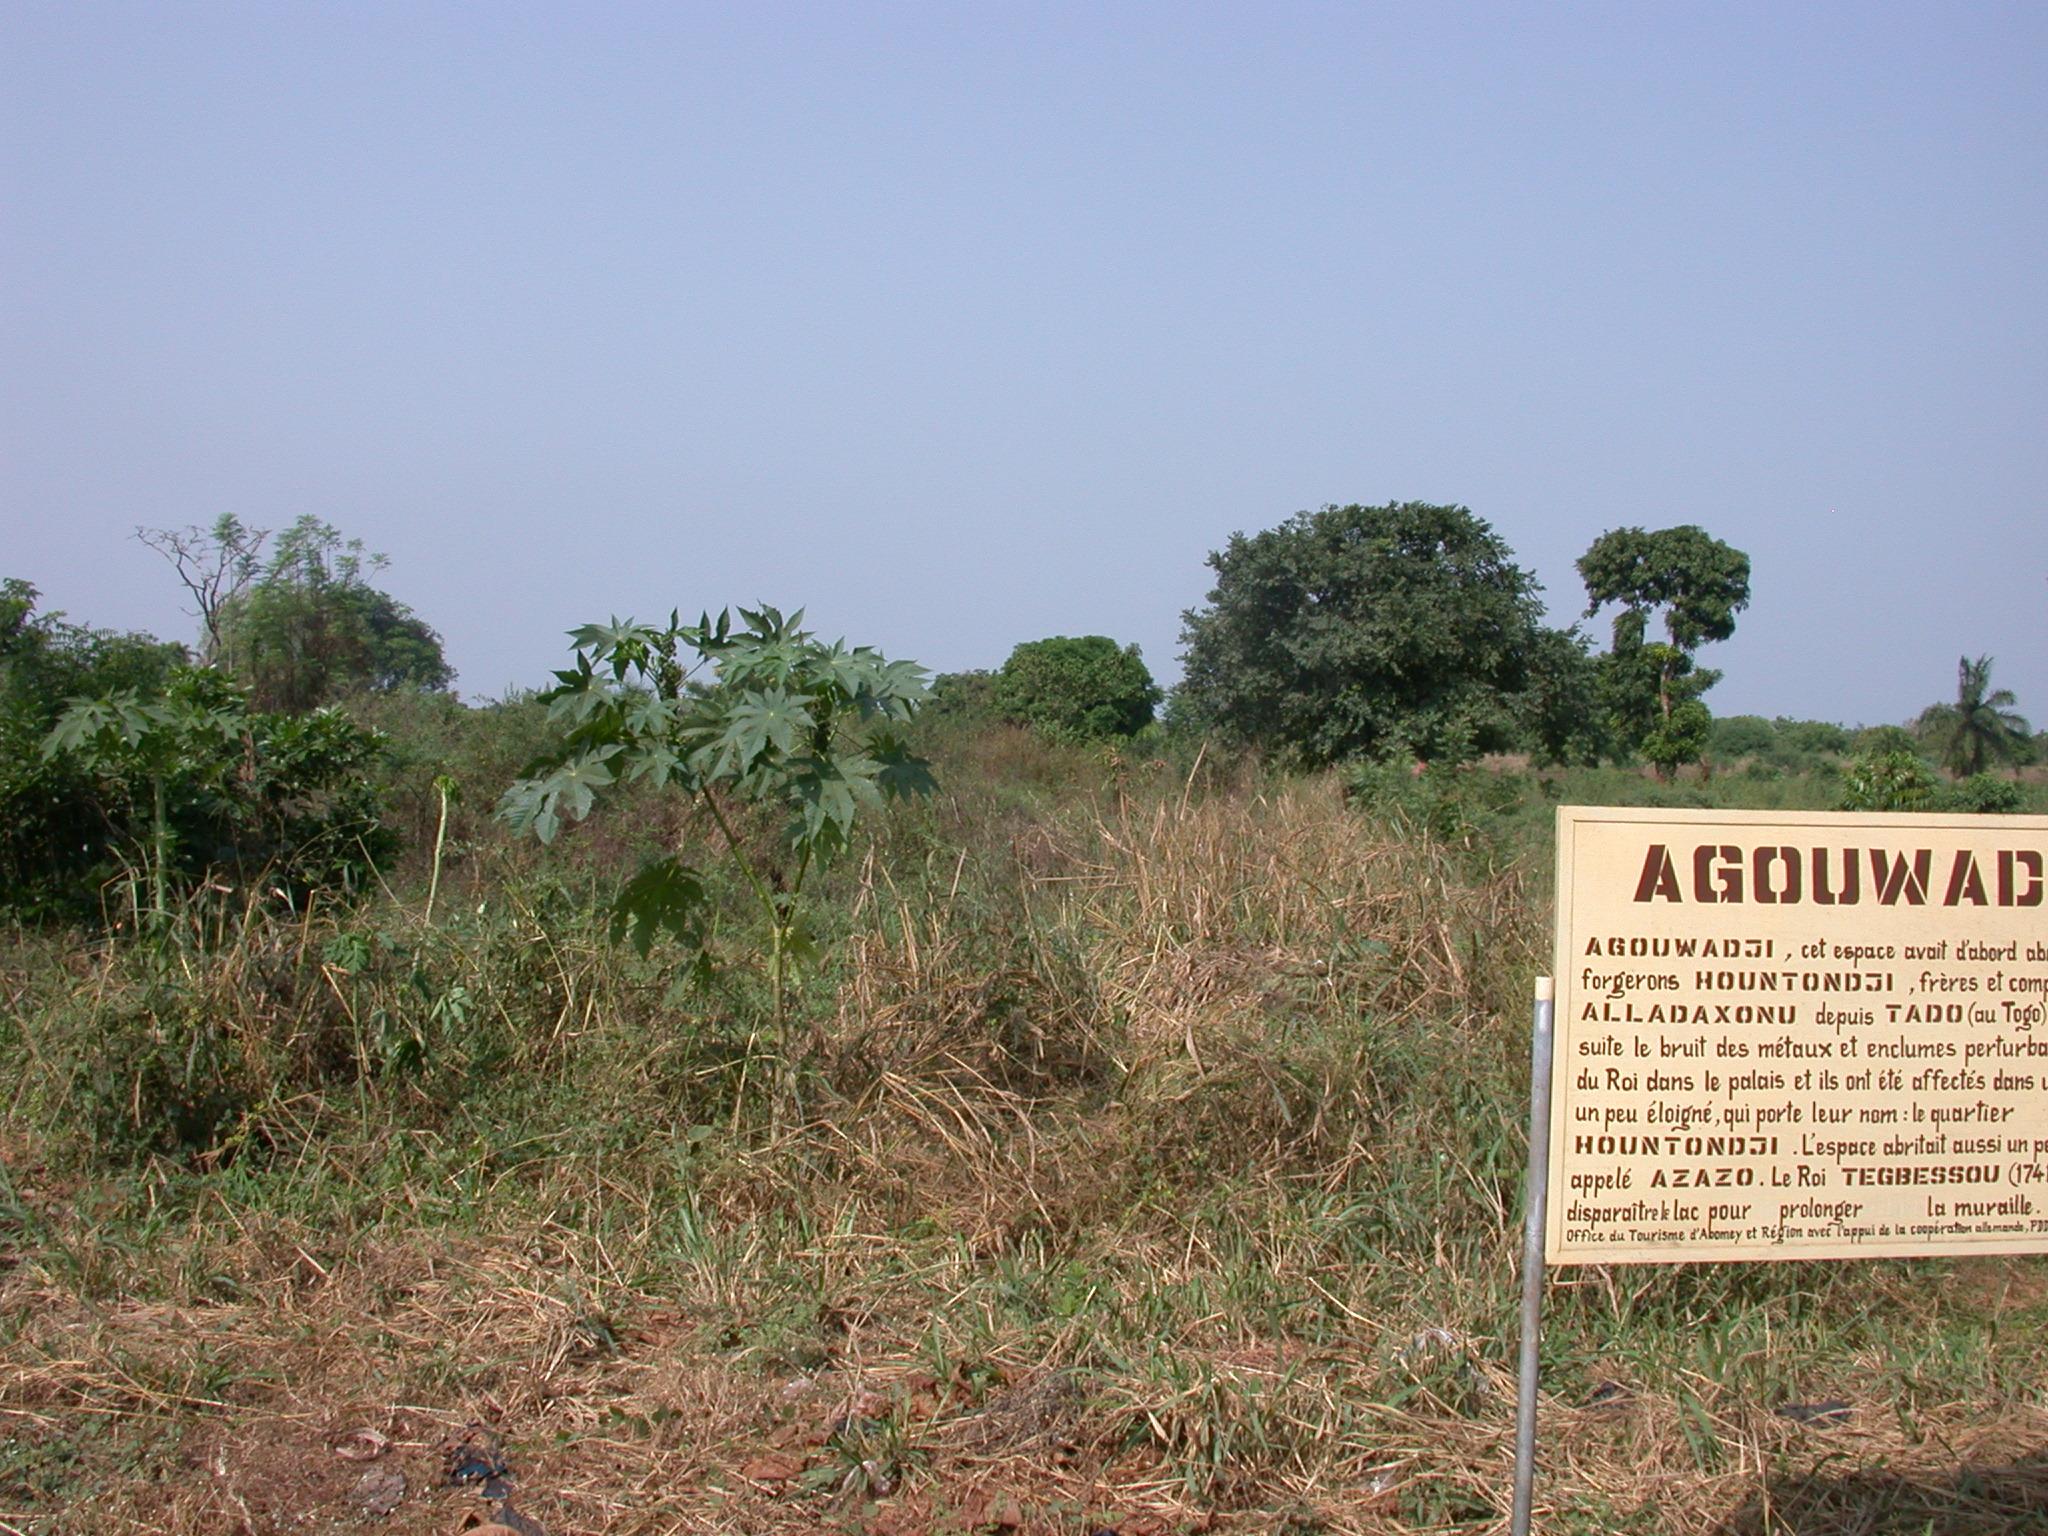 Agouwadji Blacksmith Shelter, Abomey, Benin